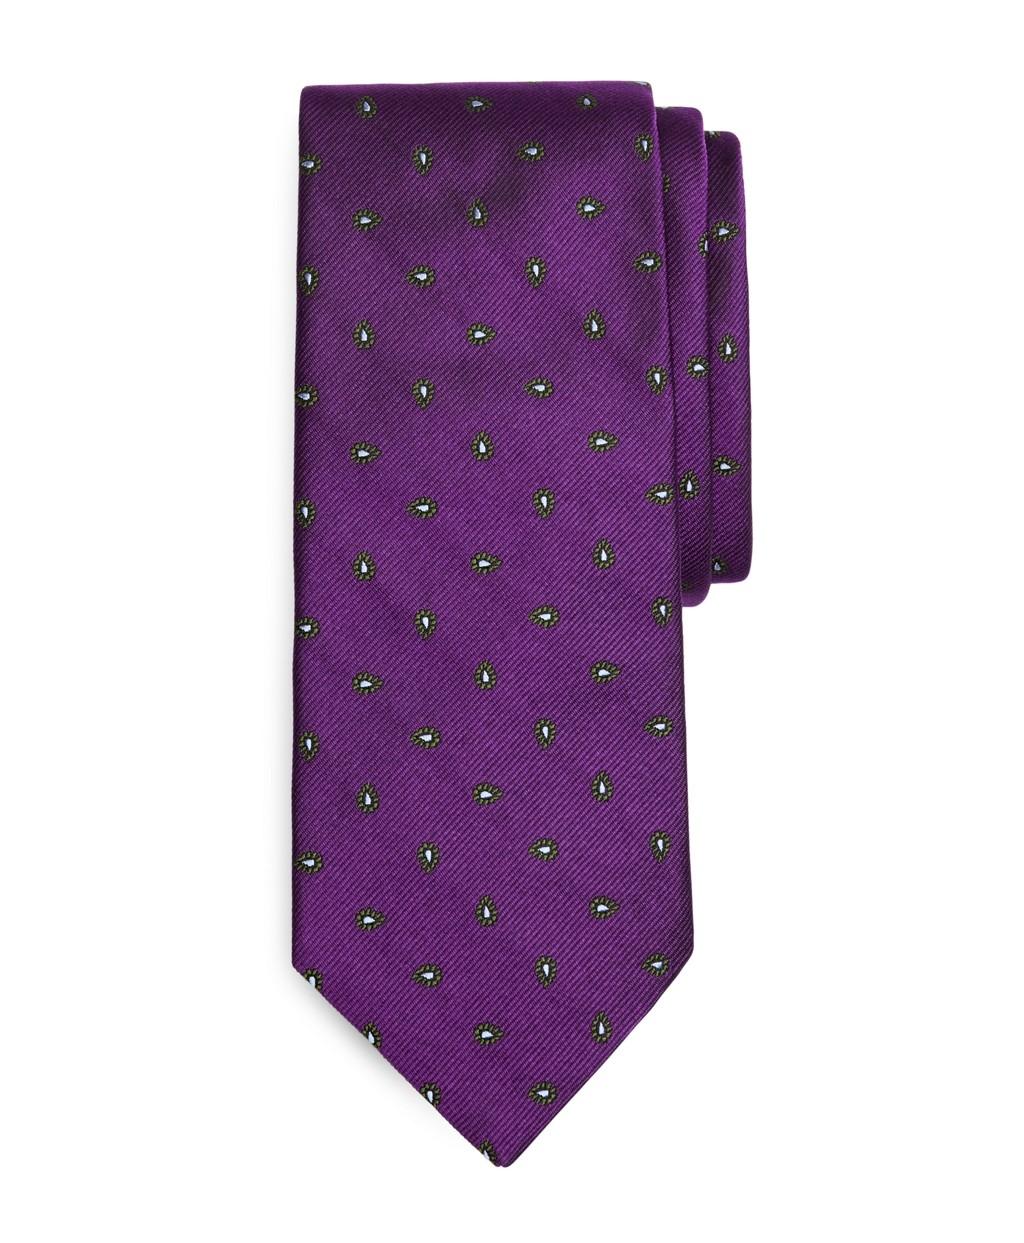 Ties On Sale, Pea Green, Silk, 2017, One Size E. Liens En Vente, Vert De Pois, De La Soie, 2017, Taille E. Marinella Marinella